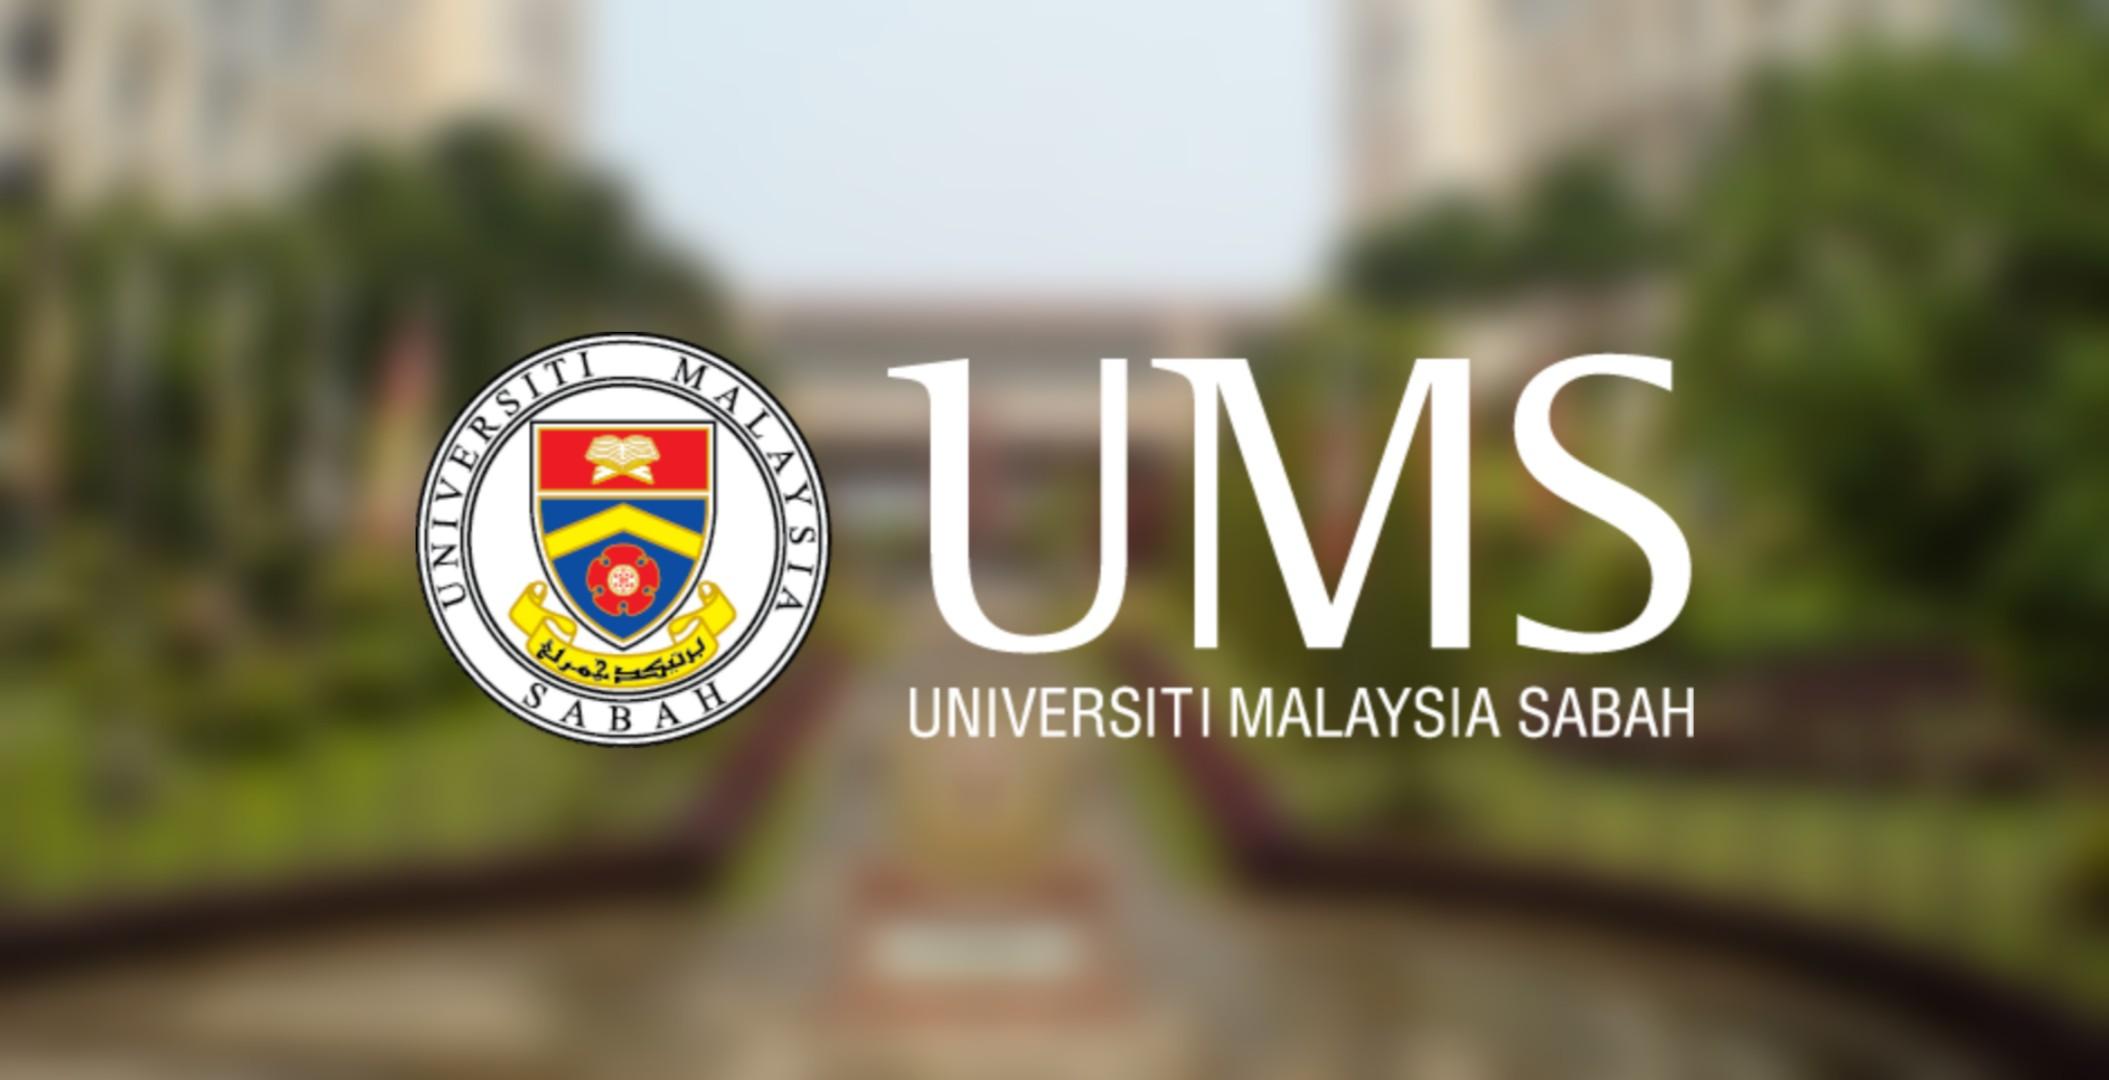 Permohonan UMS 2019 Online Universiti Malaysia Sabah